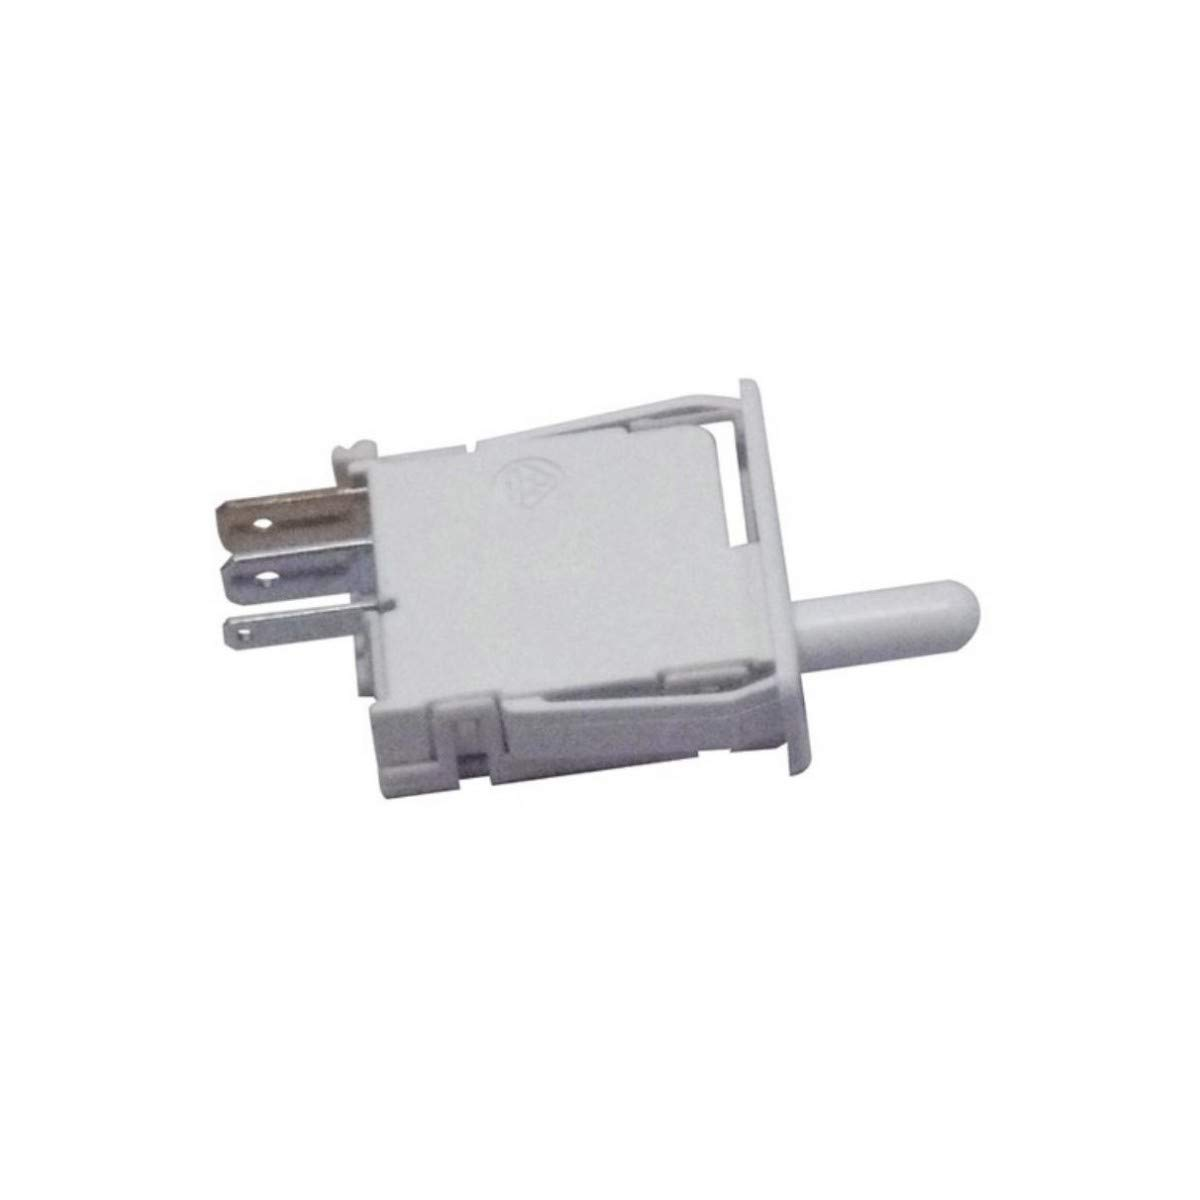 Recamania Interruptor luz frigorifico Balay 3FEB2315 609959: Amazon.es